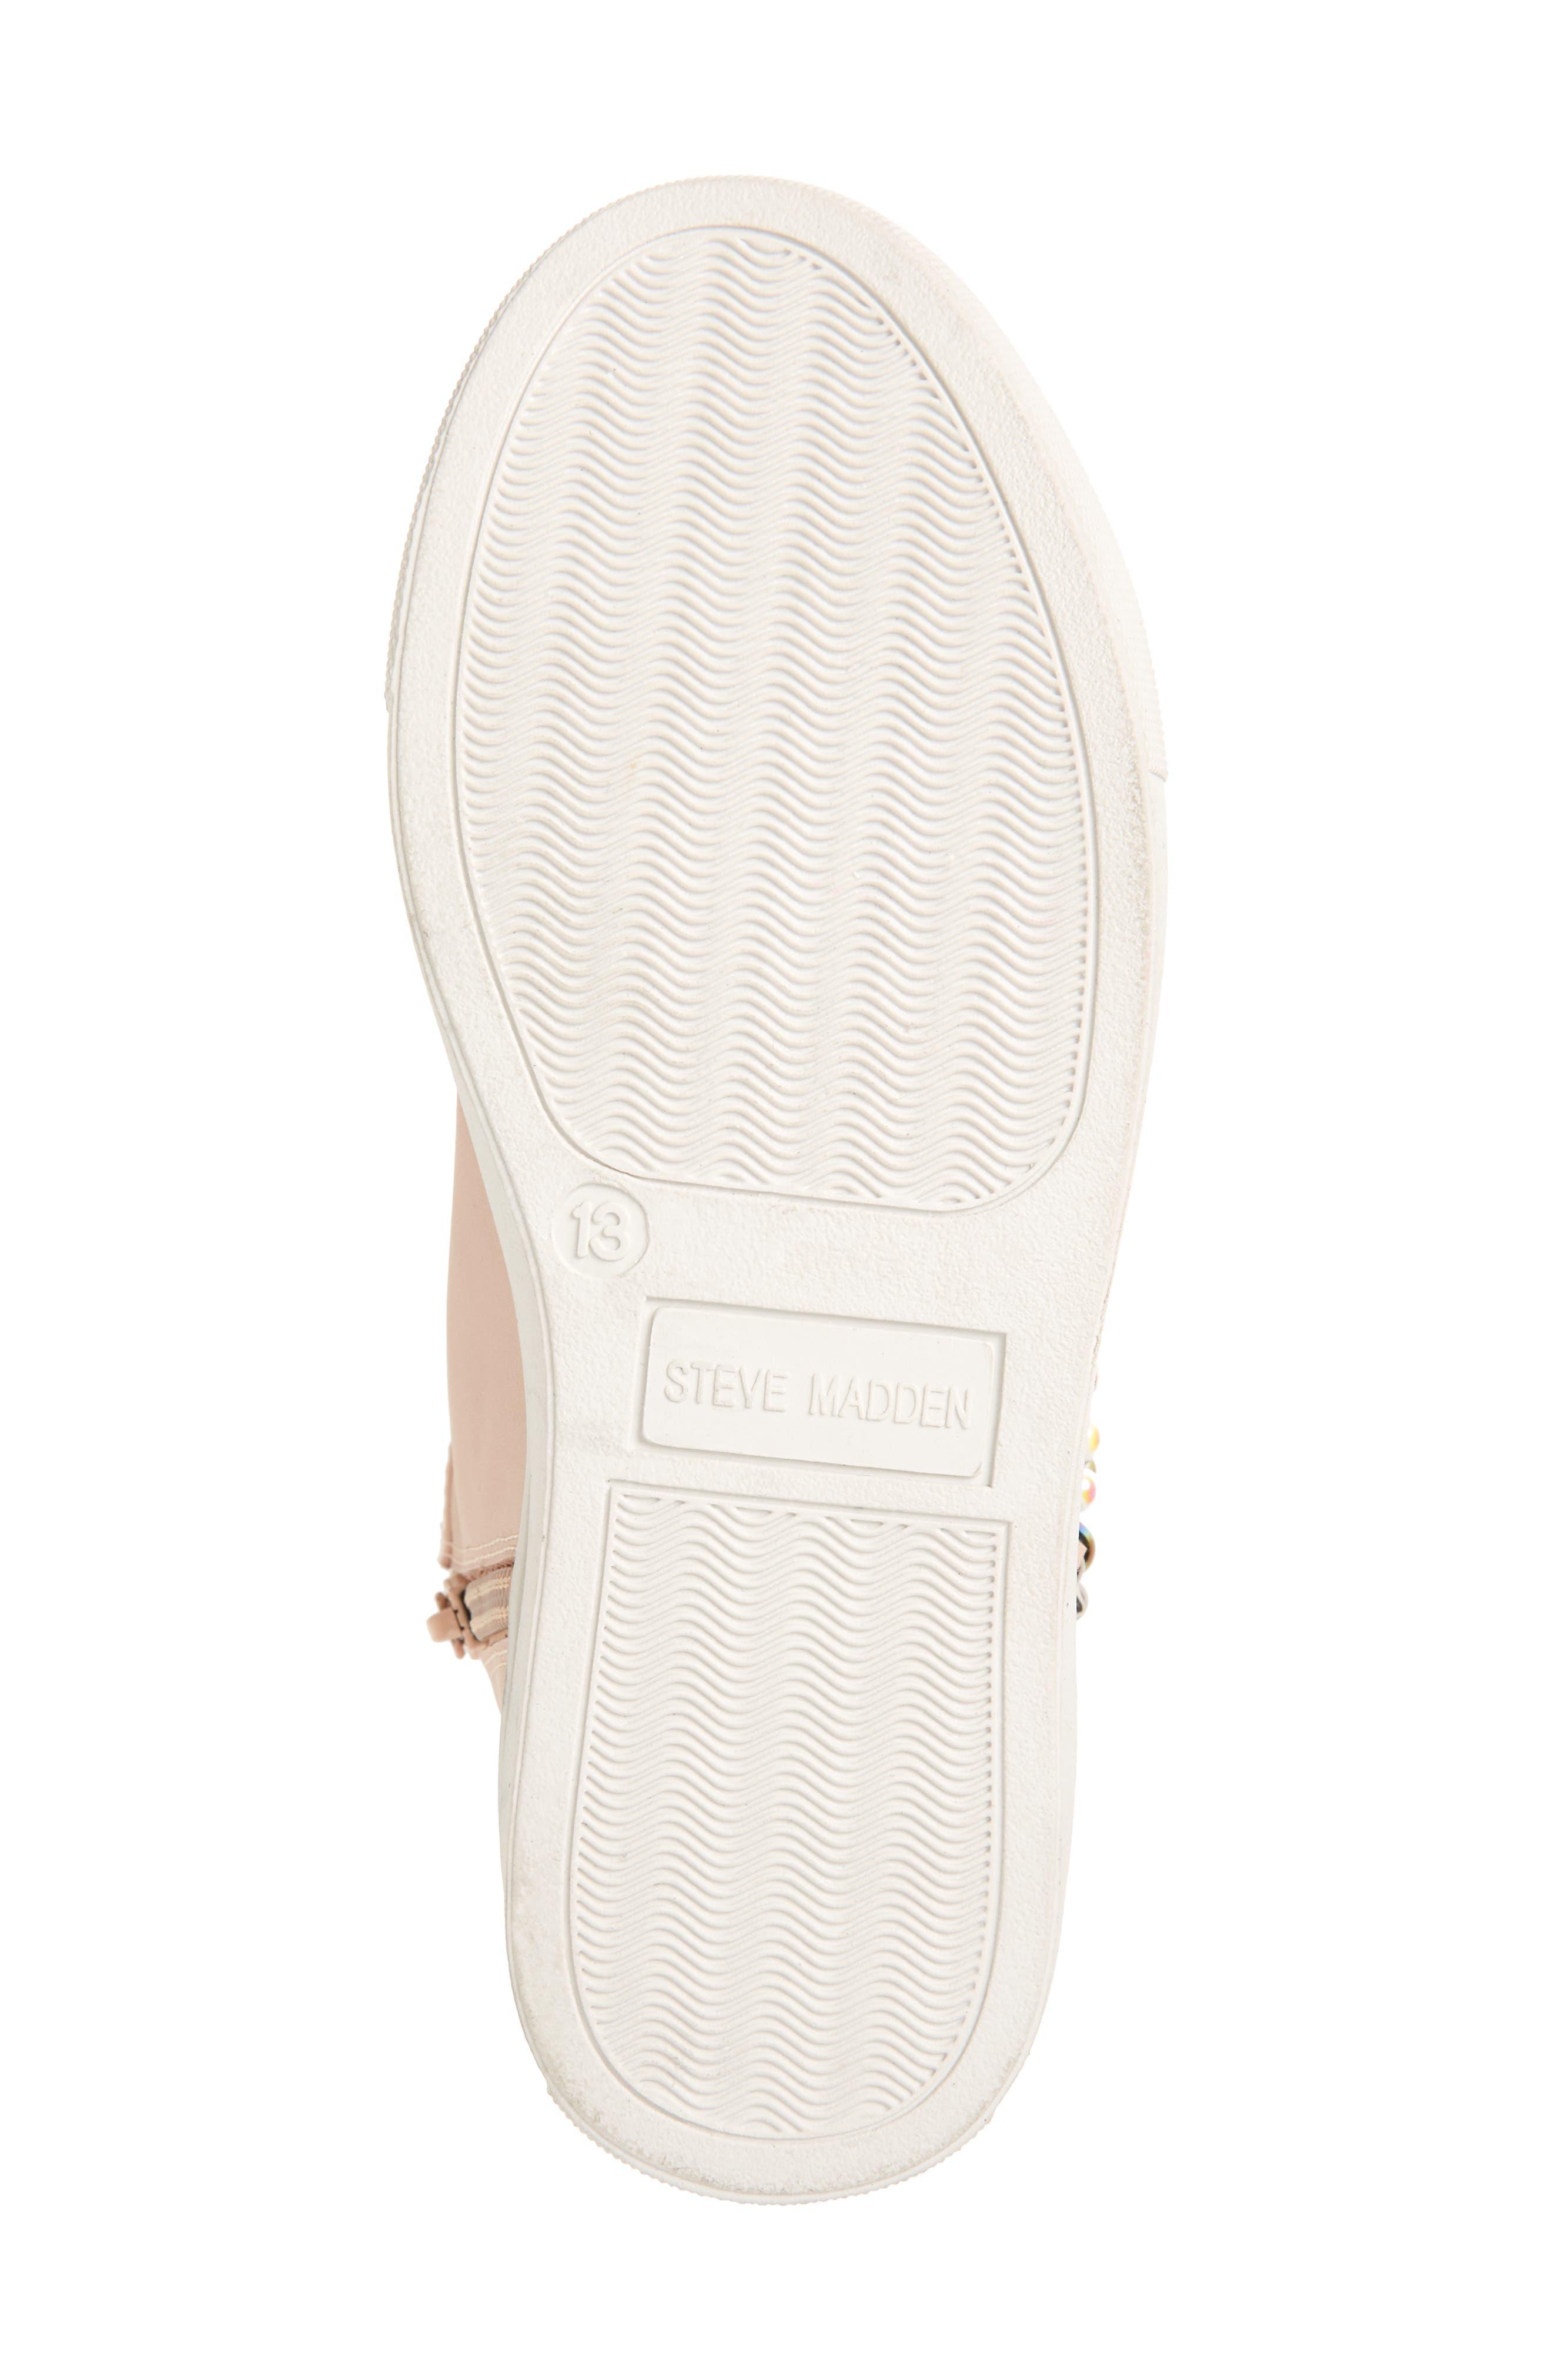 Hybrid Embellished High Top Sneaker,                             Alternate thumbnail 6, color,                             Blush